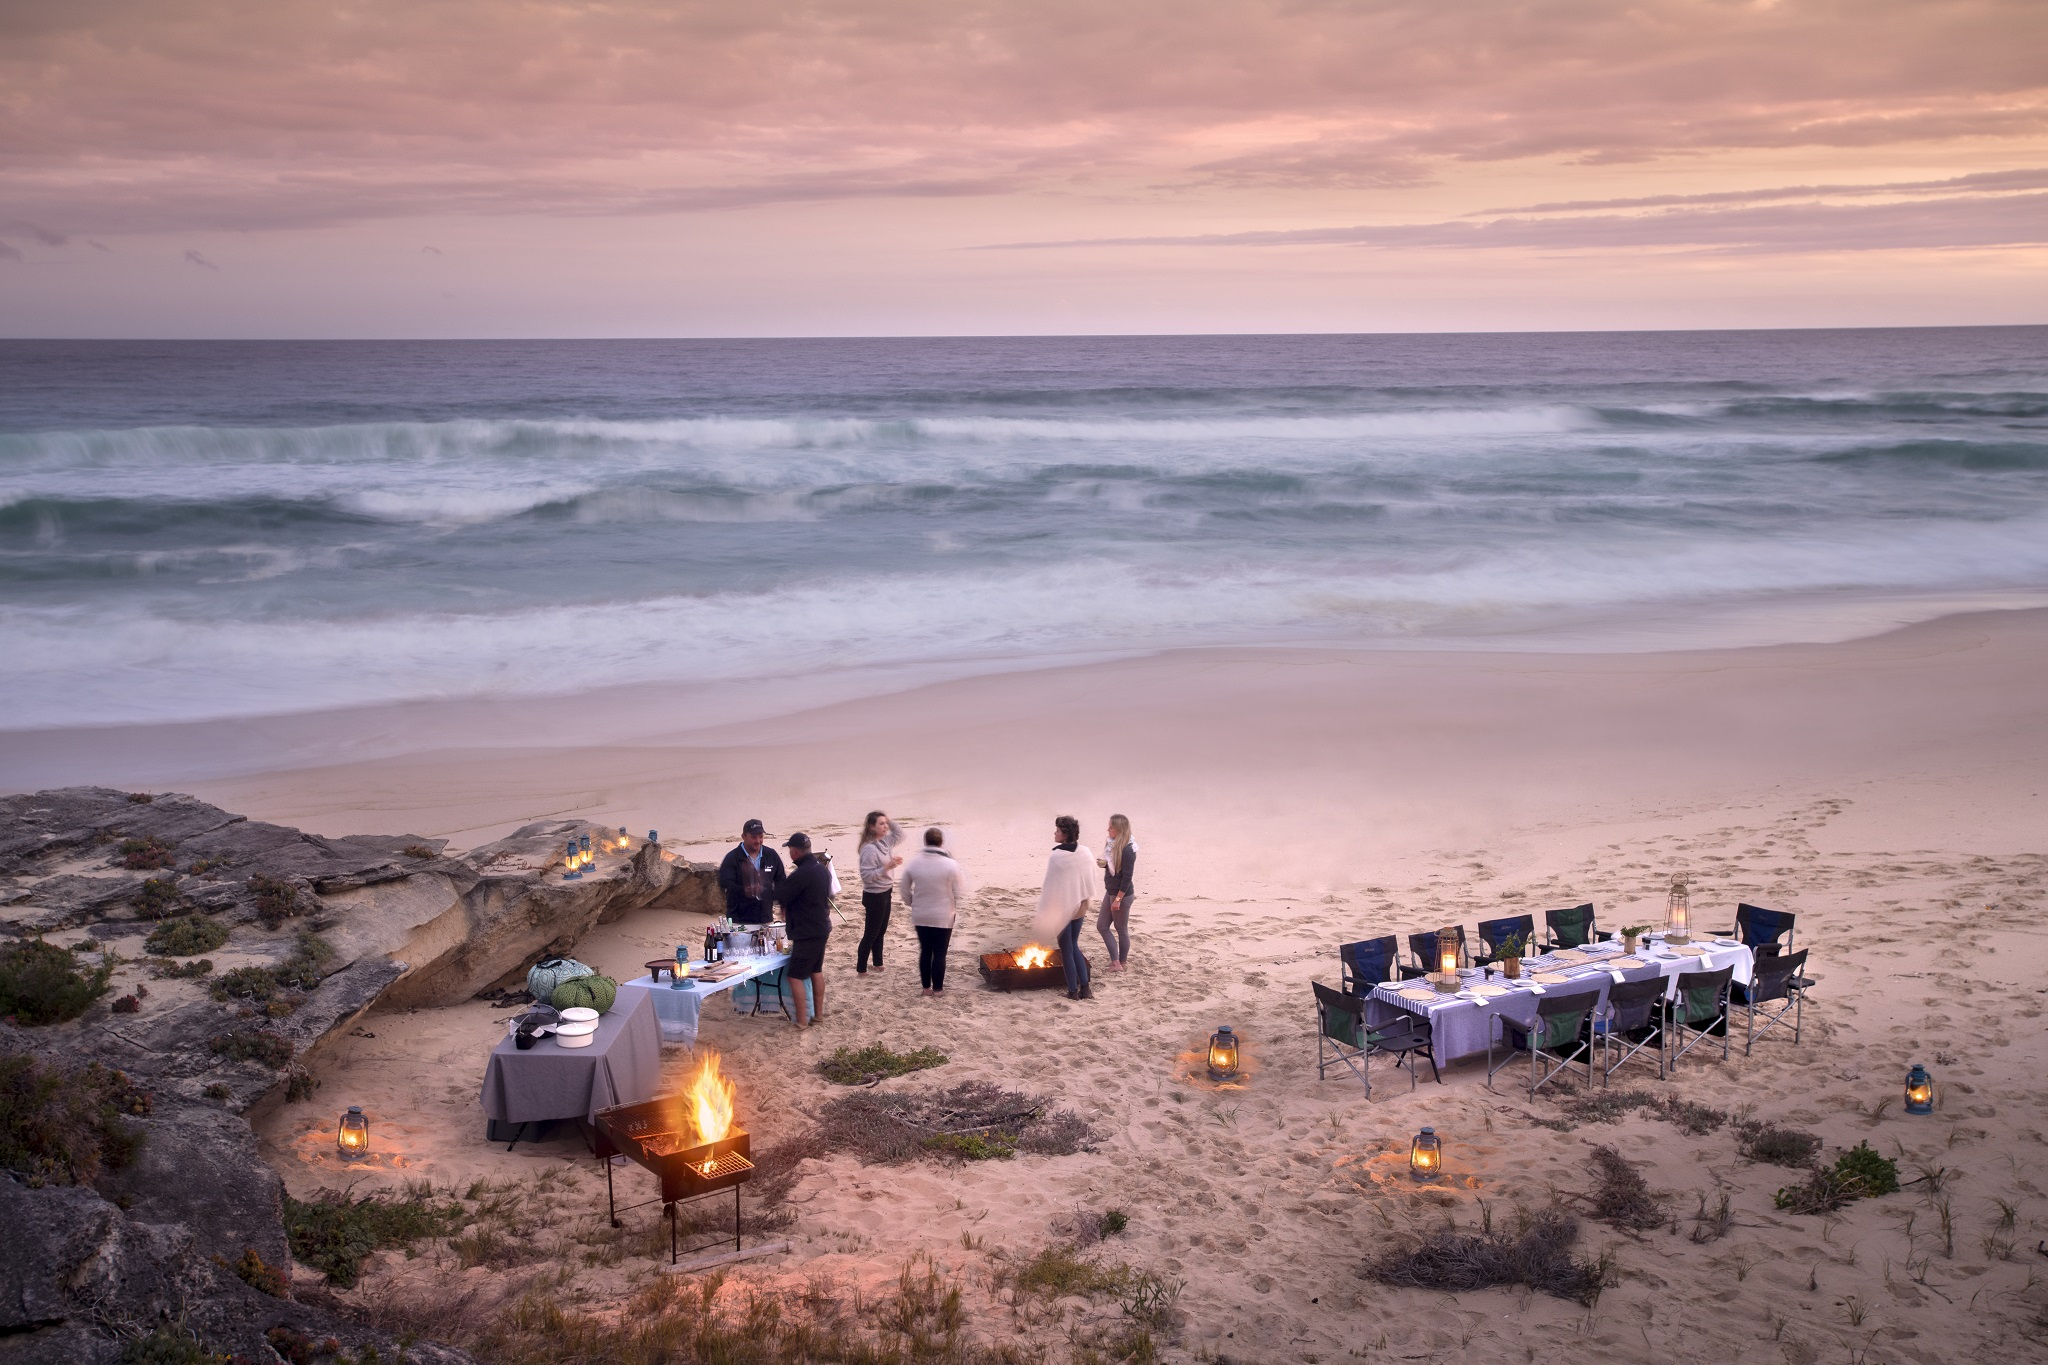 32lekkerwater_beach_lodge_-_dinner_and_sundowners_on_the_beach.jpg